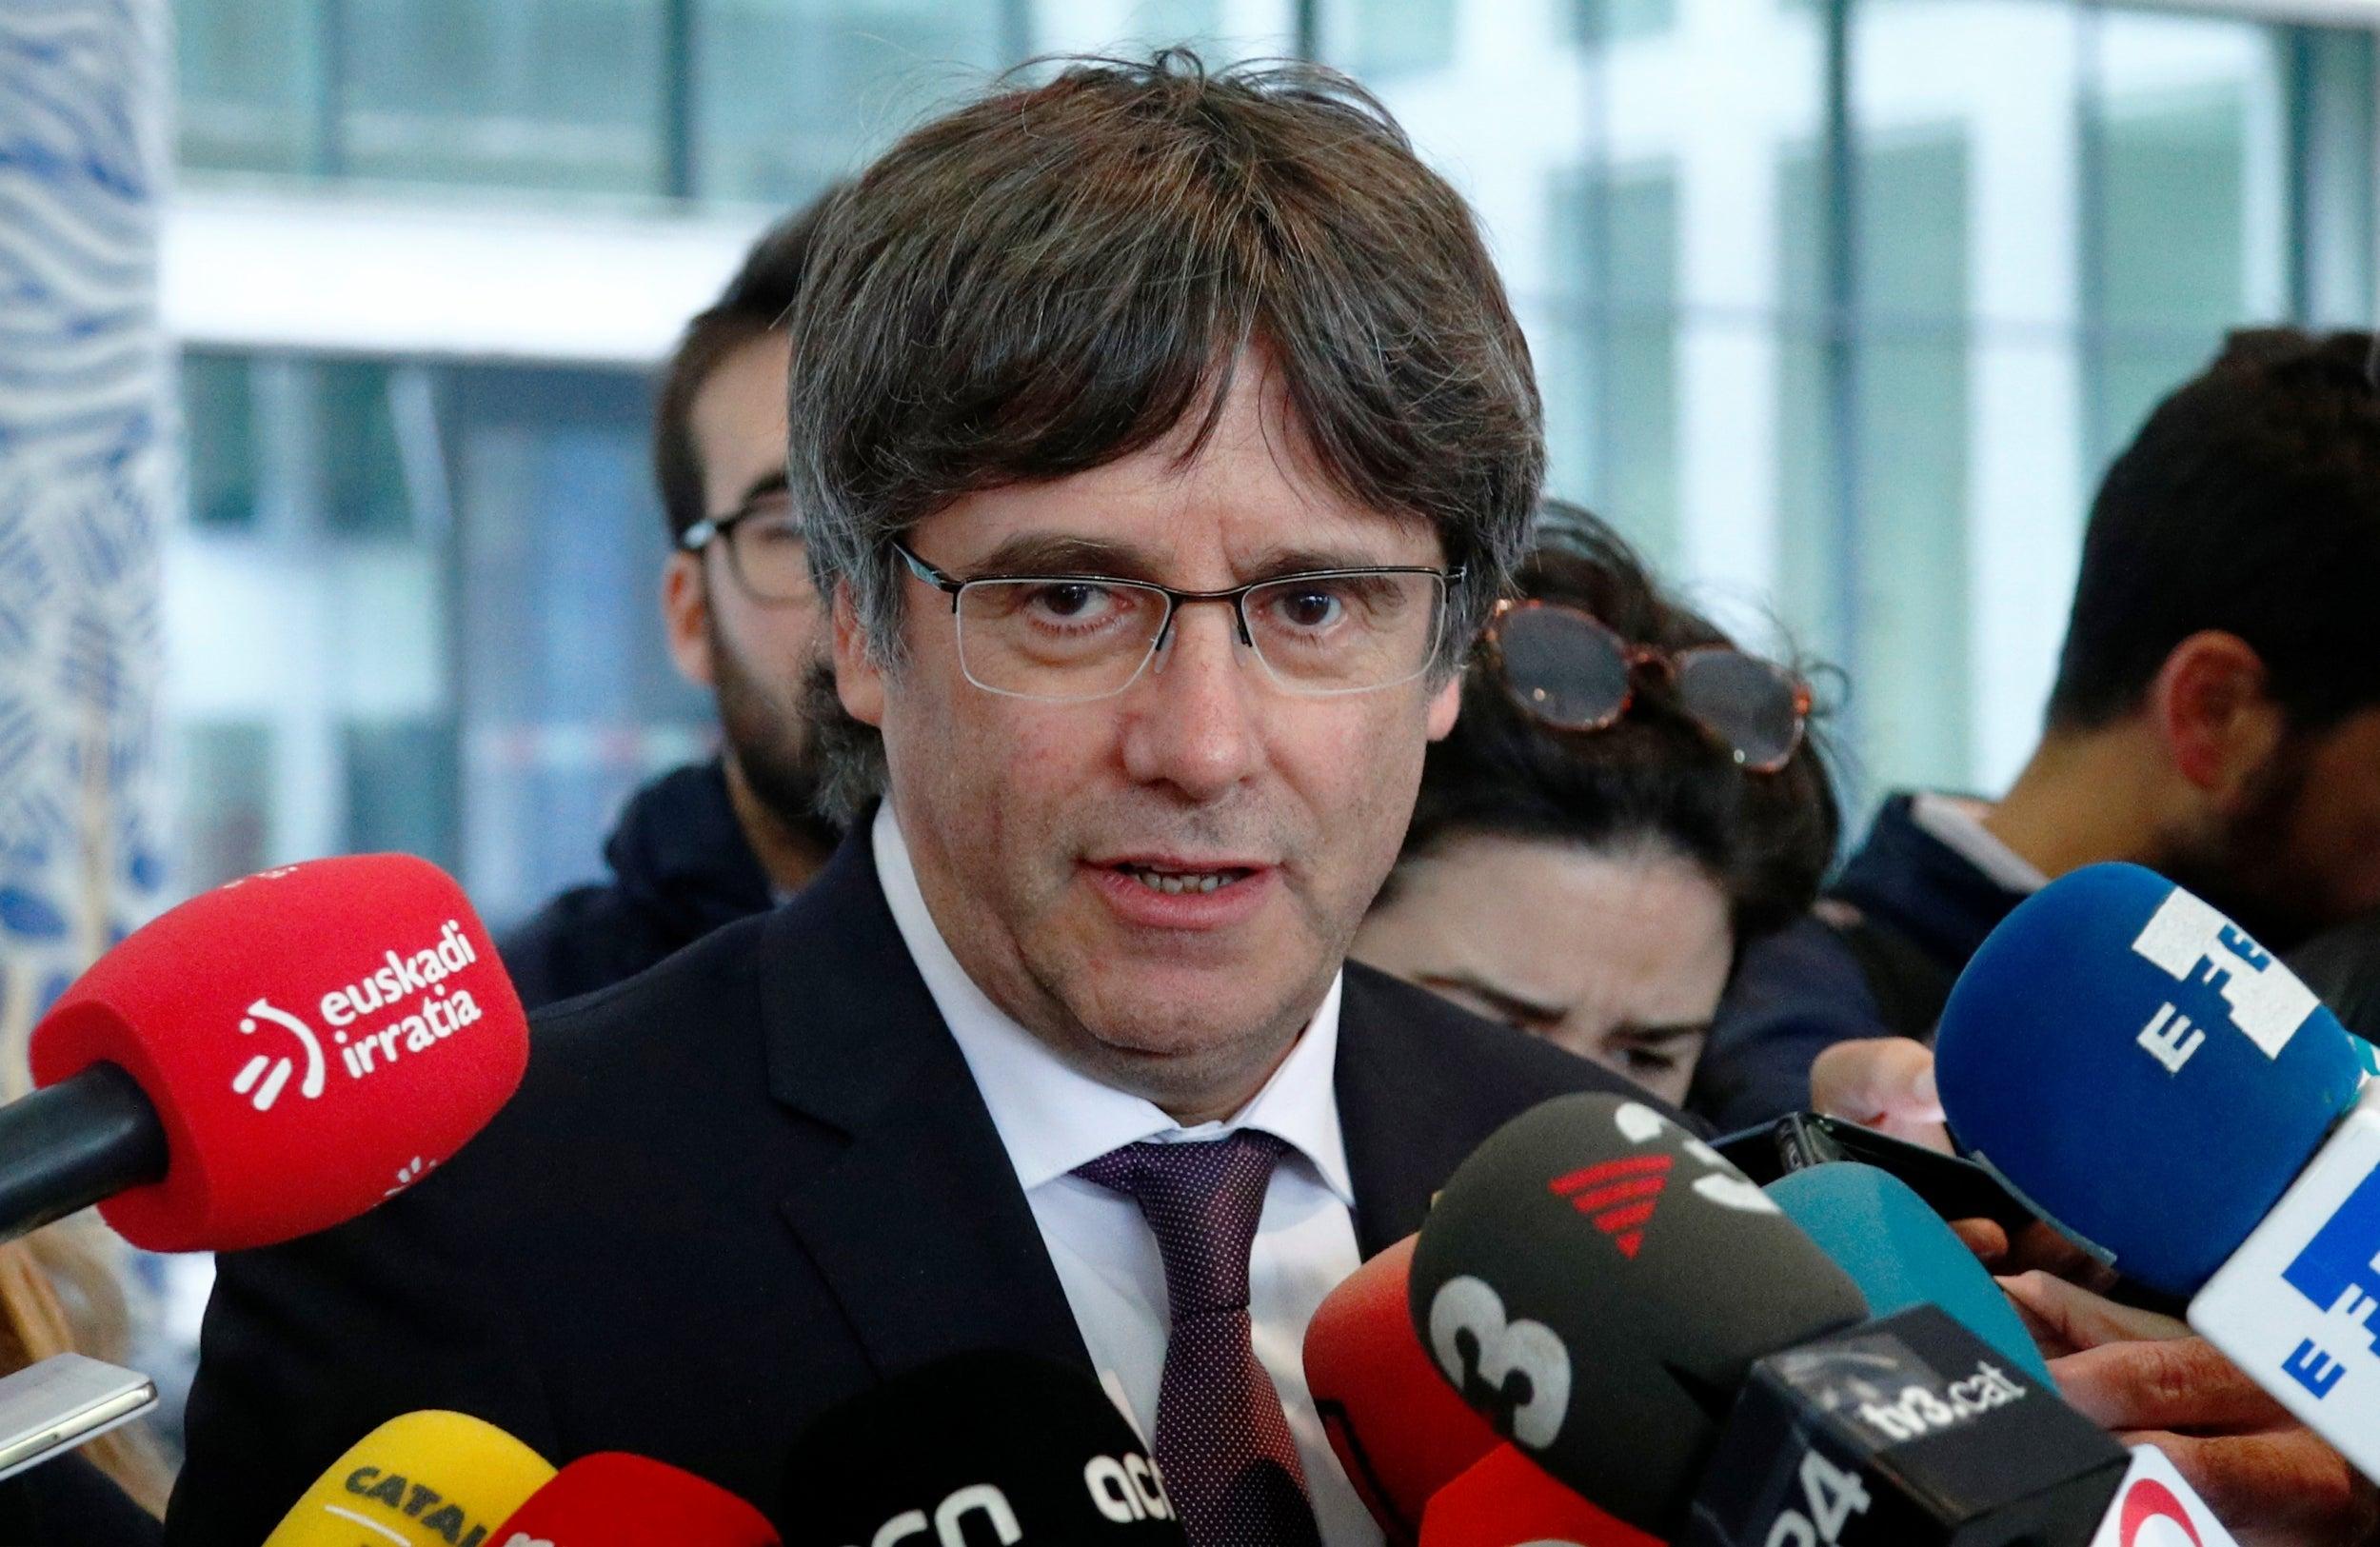 Carles Puigdemont: Former Catalan leader hands himself in to Belgian authorities